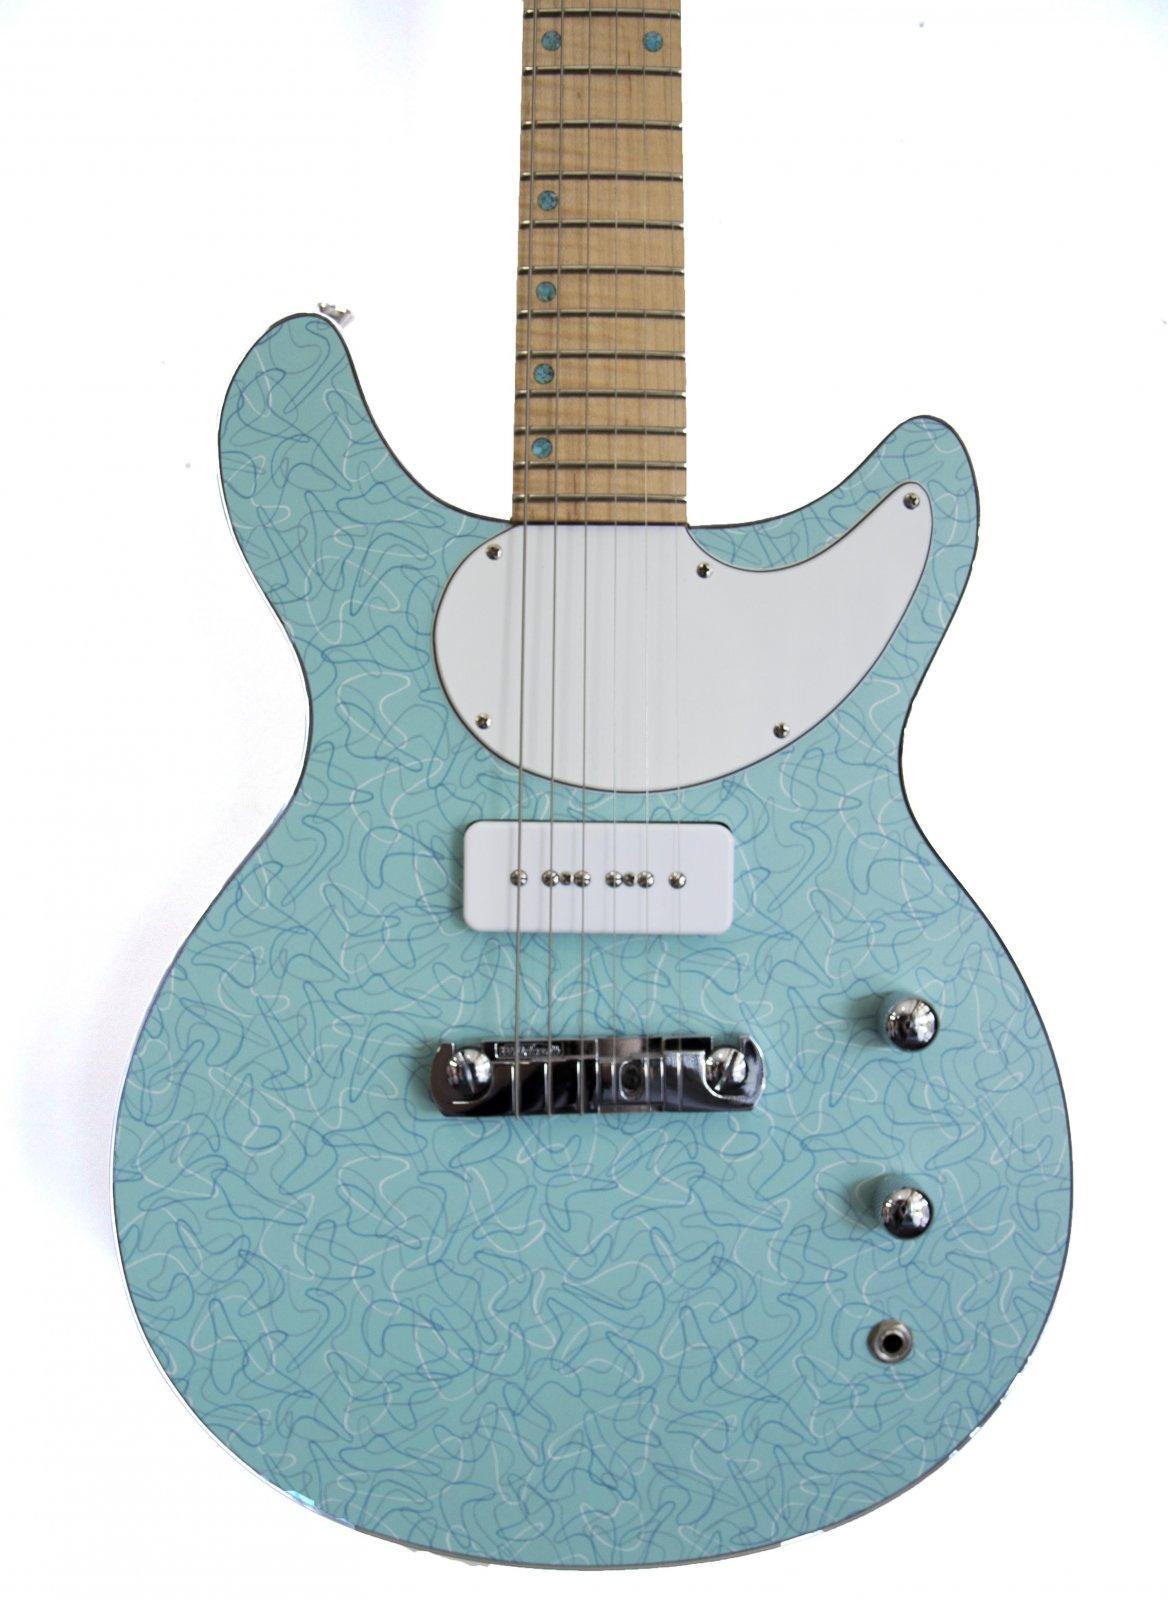 C 12735 - Joe's Guitars 6 String Diner W/Hard Case